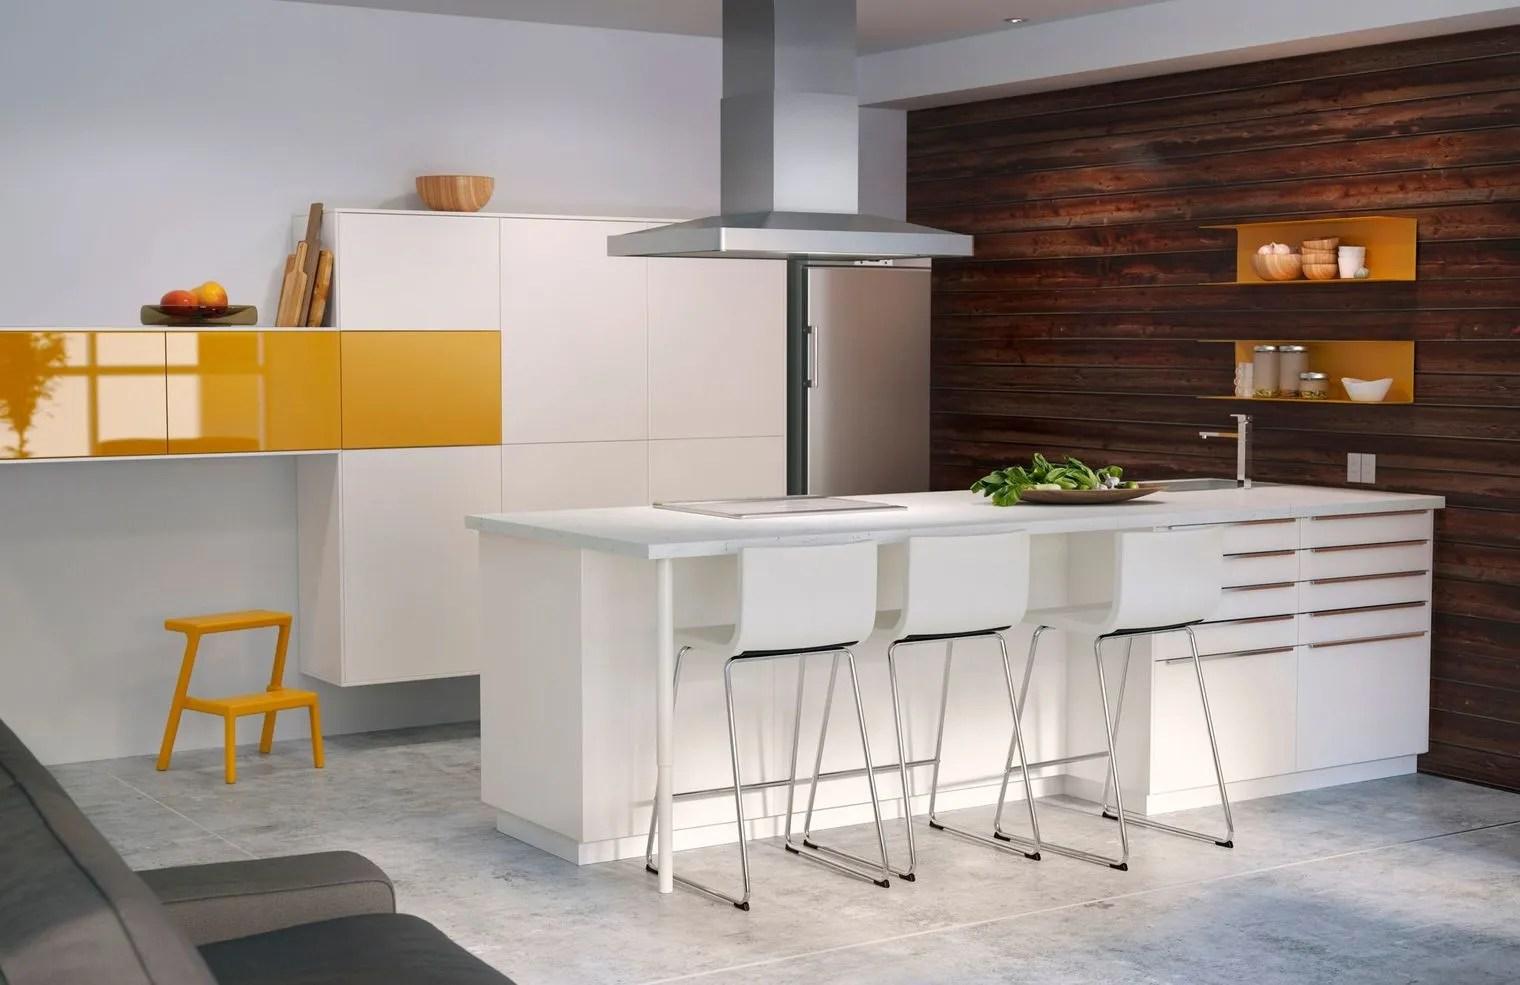 cool interesting finest cuisine ikea cuisine ikea ringhult gris cuisine ikea ringhult gris cik. Black Bedroom Furniture Sets. Home Design Ideas